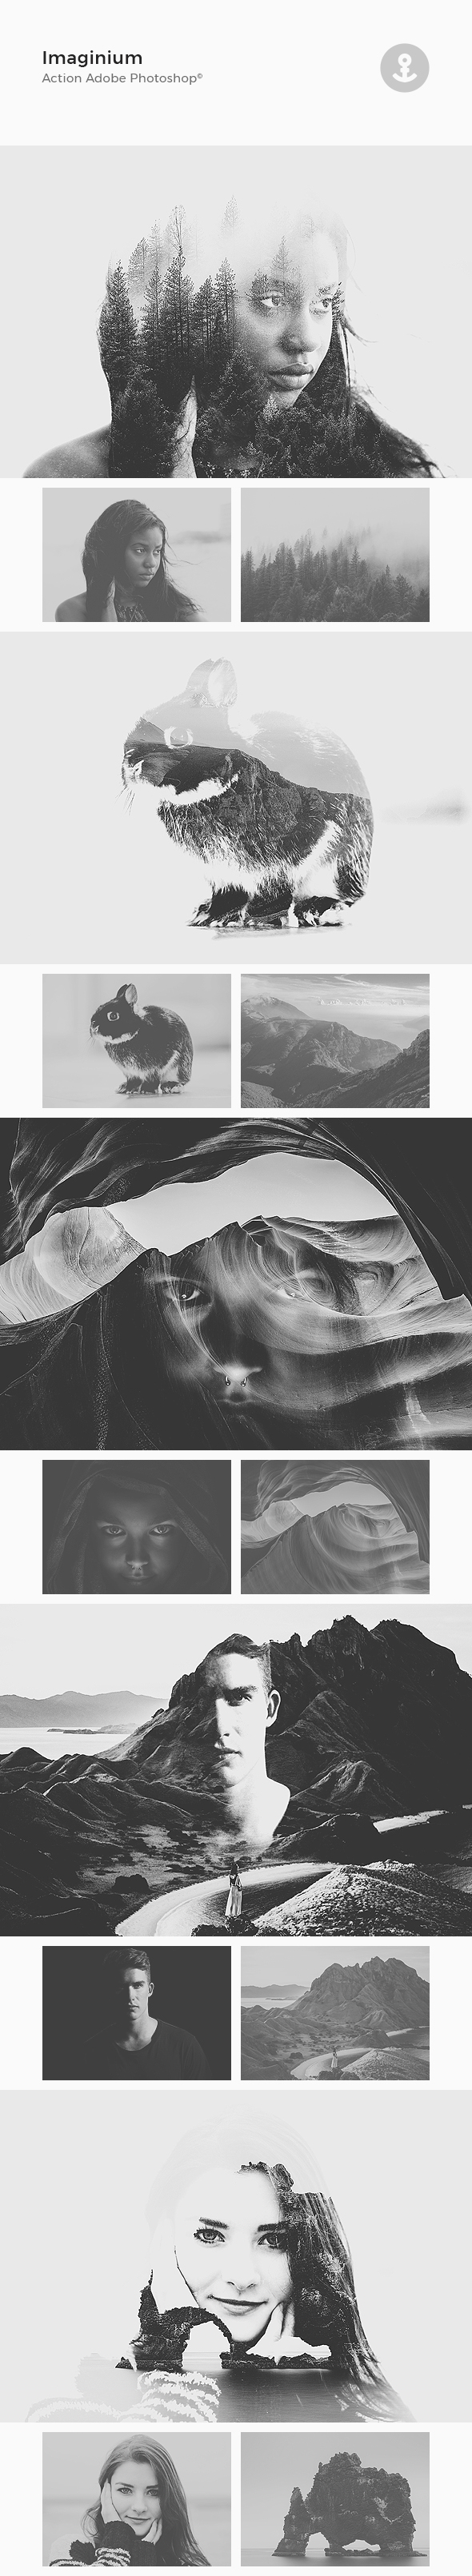 Imaginium Action Photoshop - Photo Effects Actions